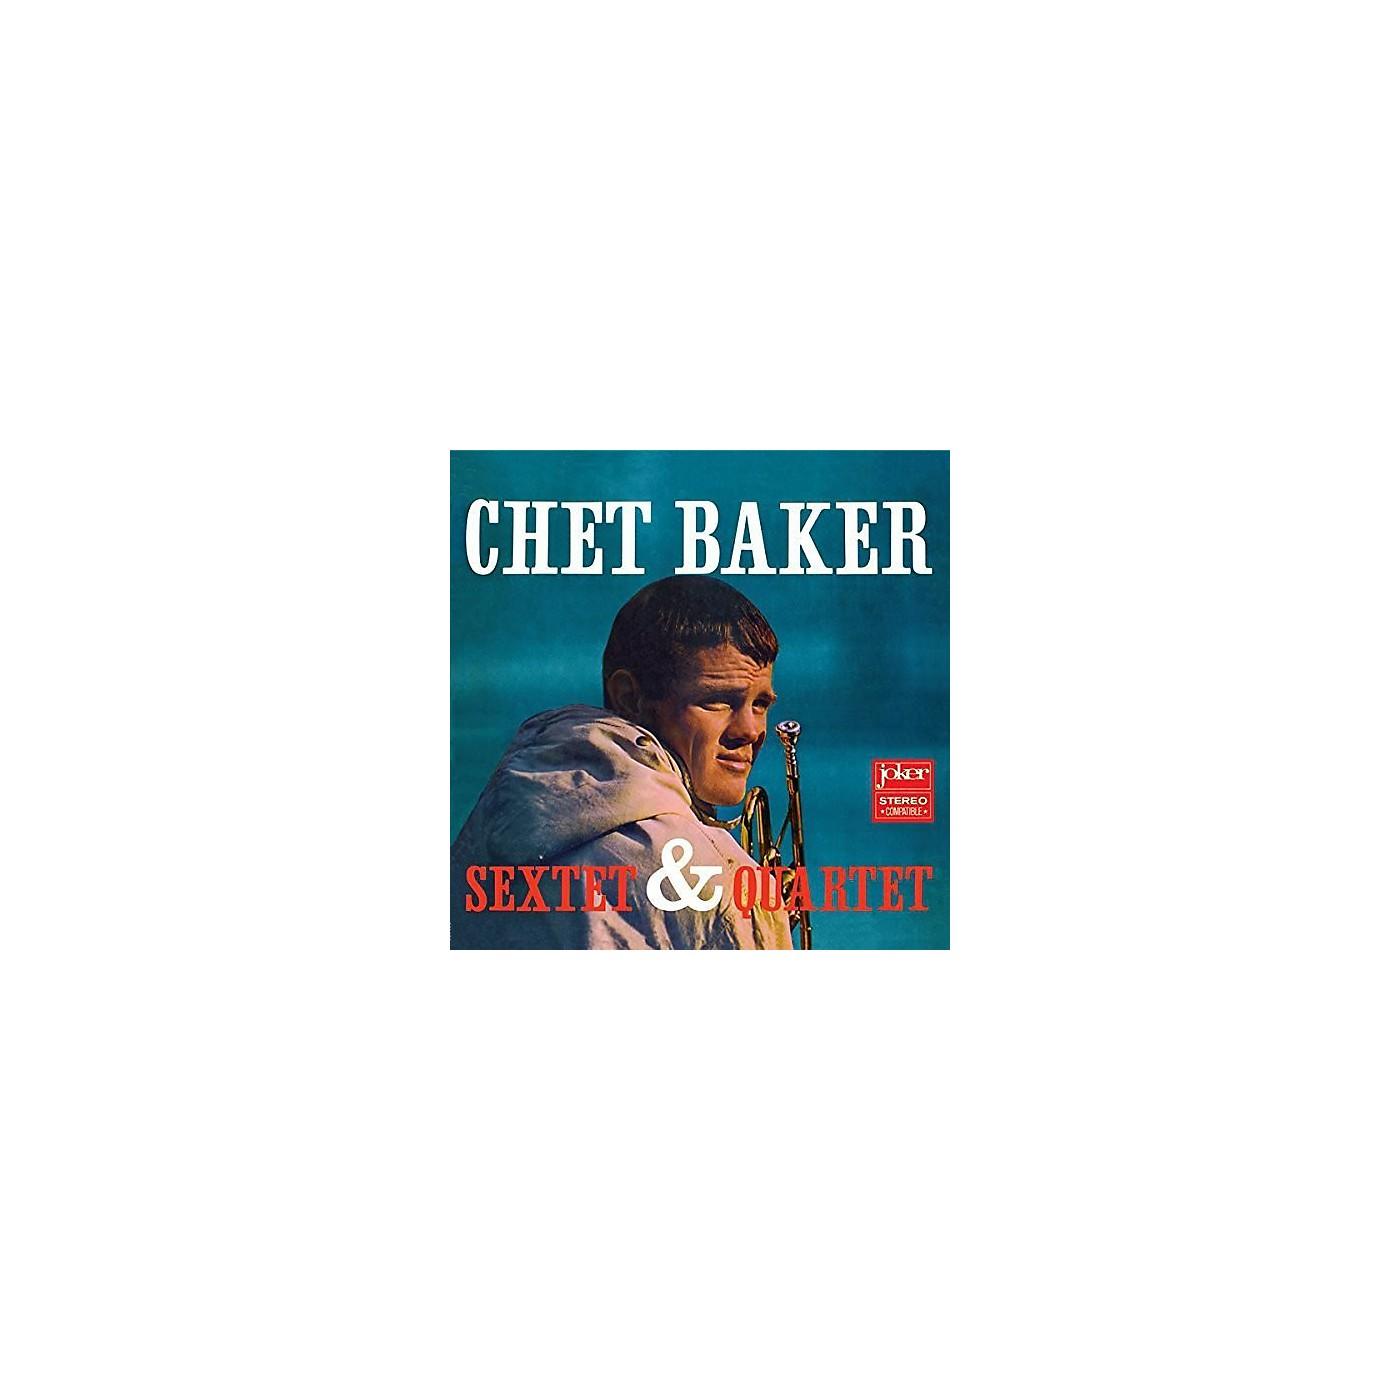 Alliance Chet Baker - Sextet & Quartet thumbnail